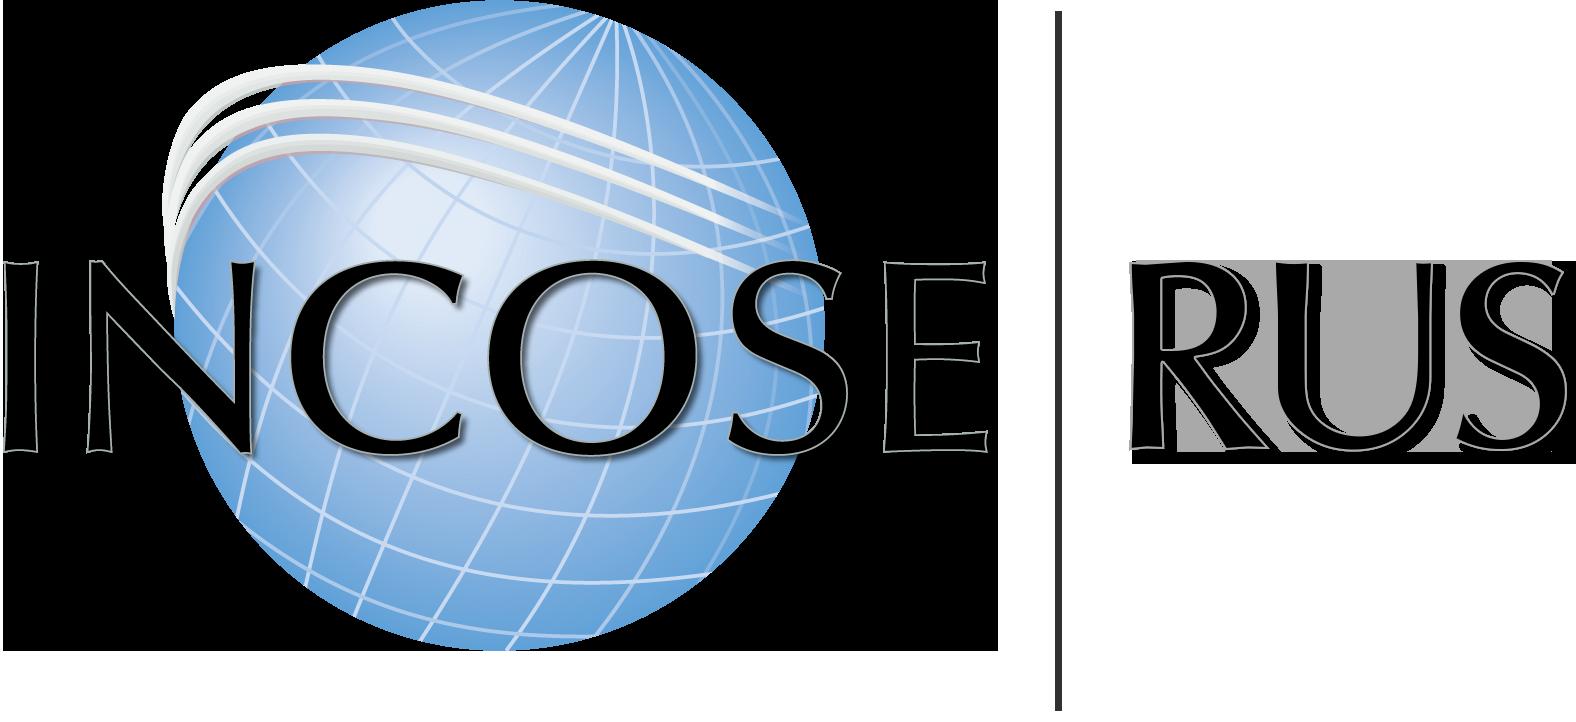 INCOSE-RUS-logo-2016.png